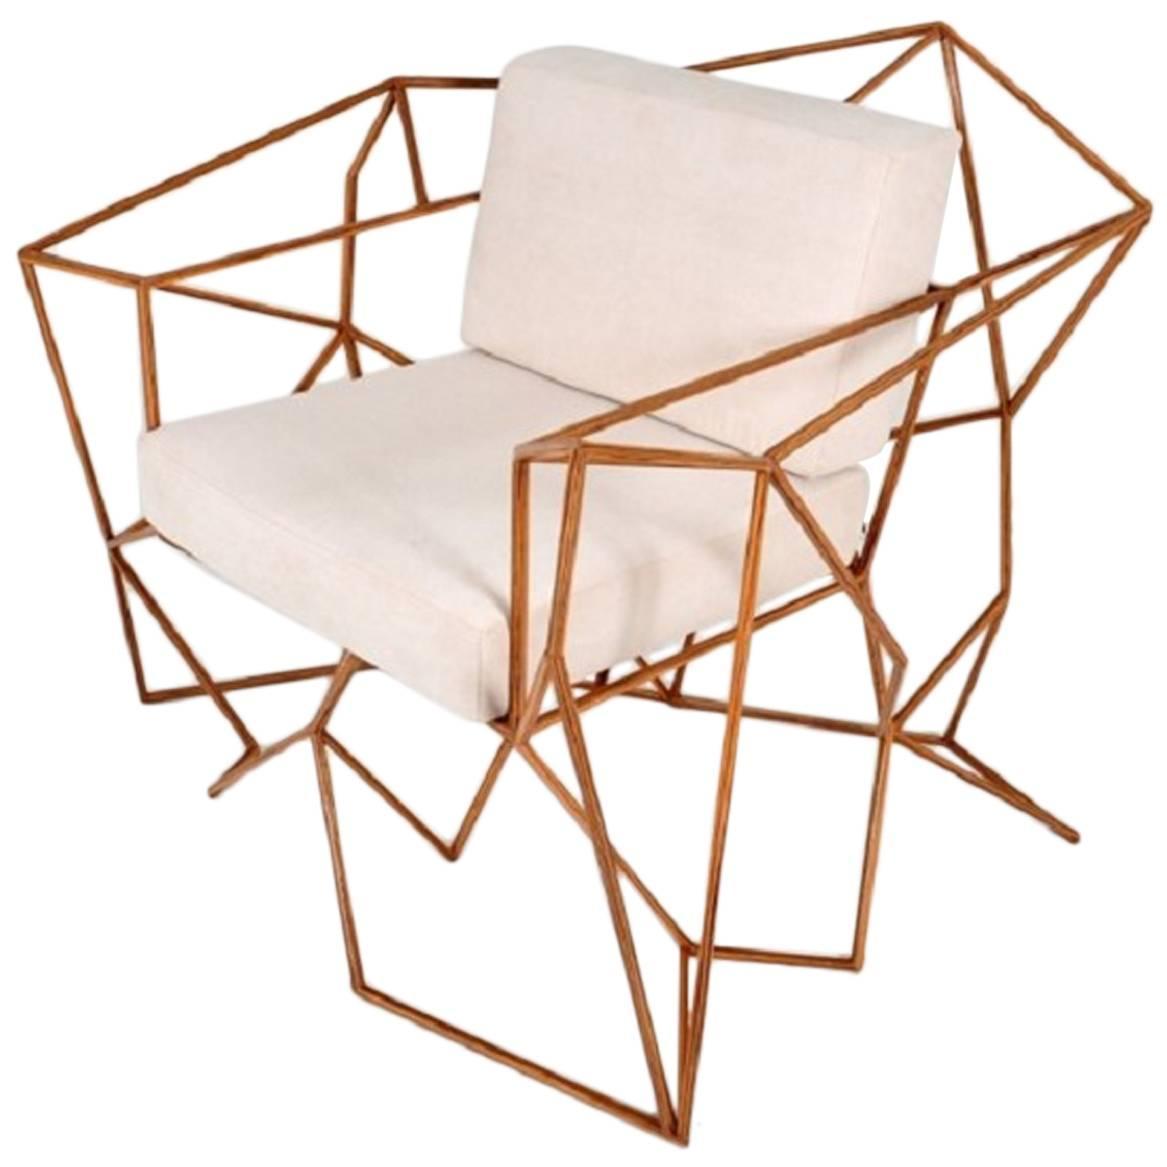 """Eduardo"" Armchair by Leonardo Bueno For Sale at 1stdibs"